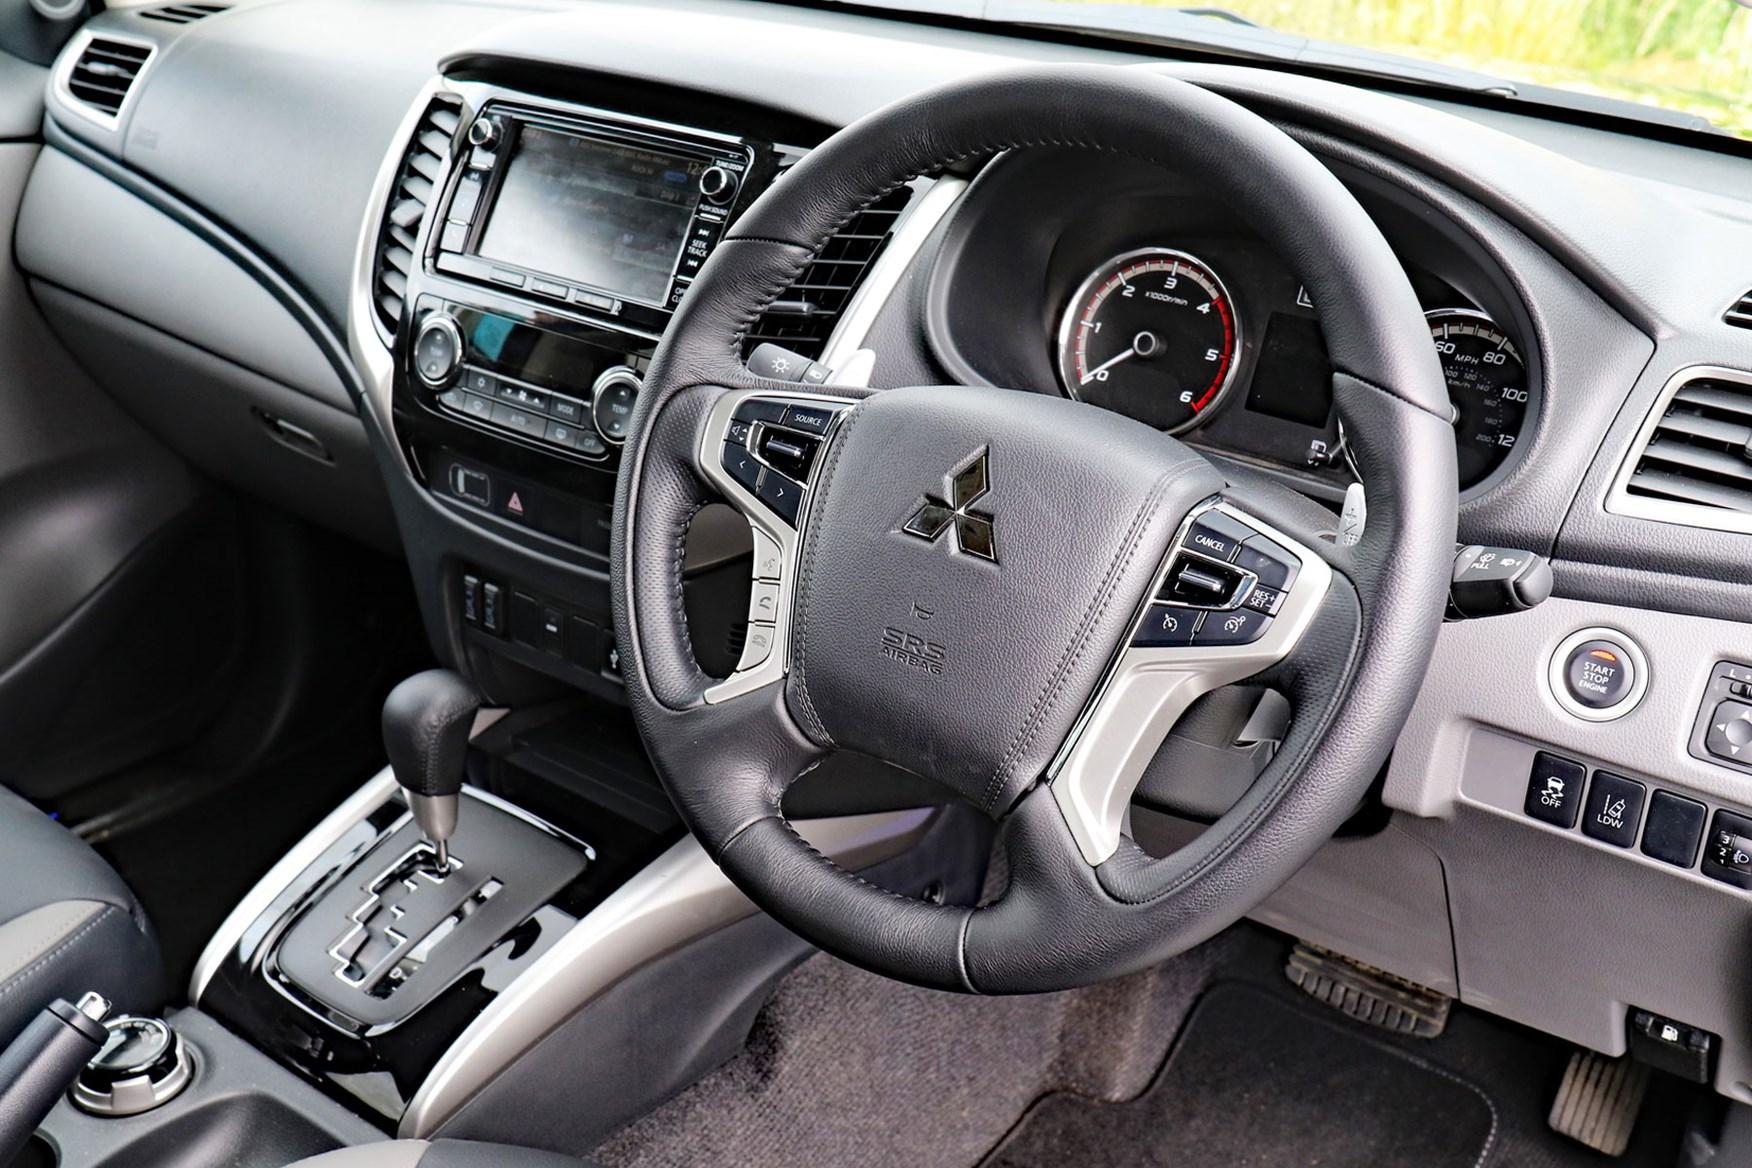 Mitsubishi L200 Barbarian SVP review - cab interior, dashboard, steering wheel